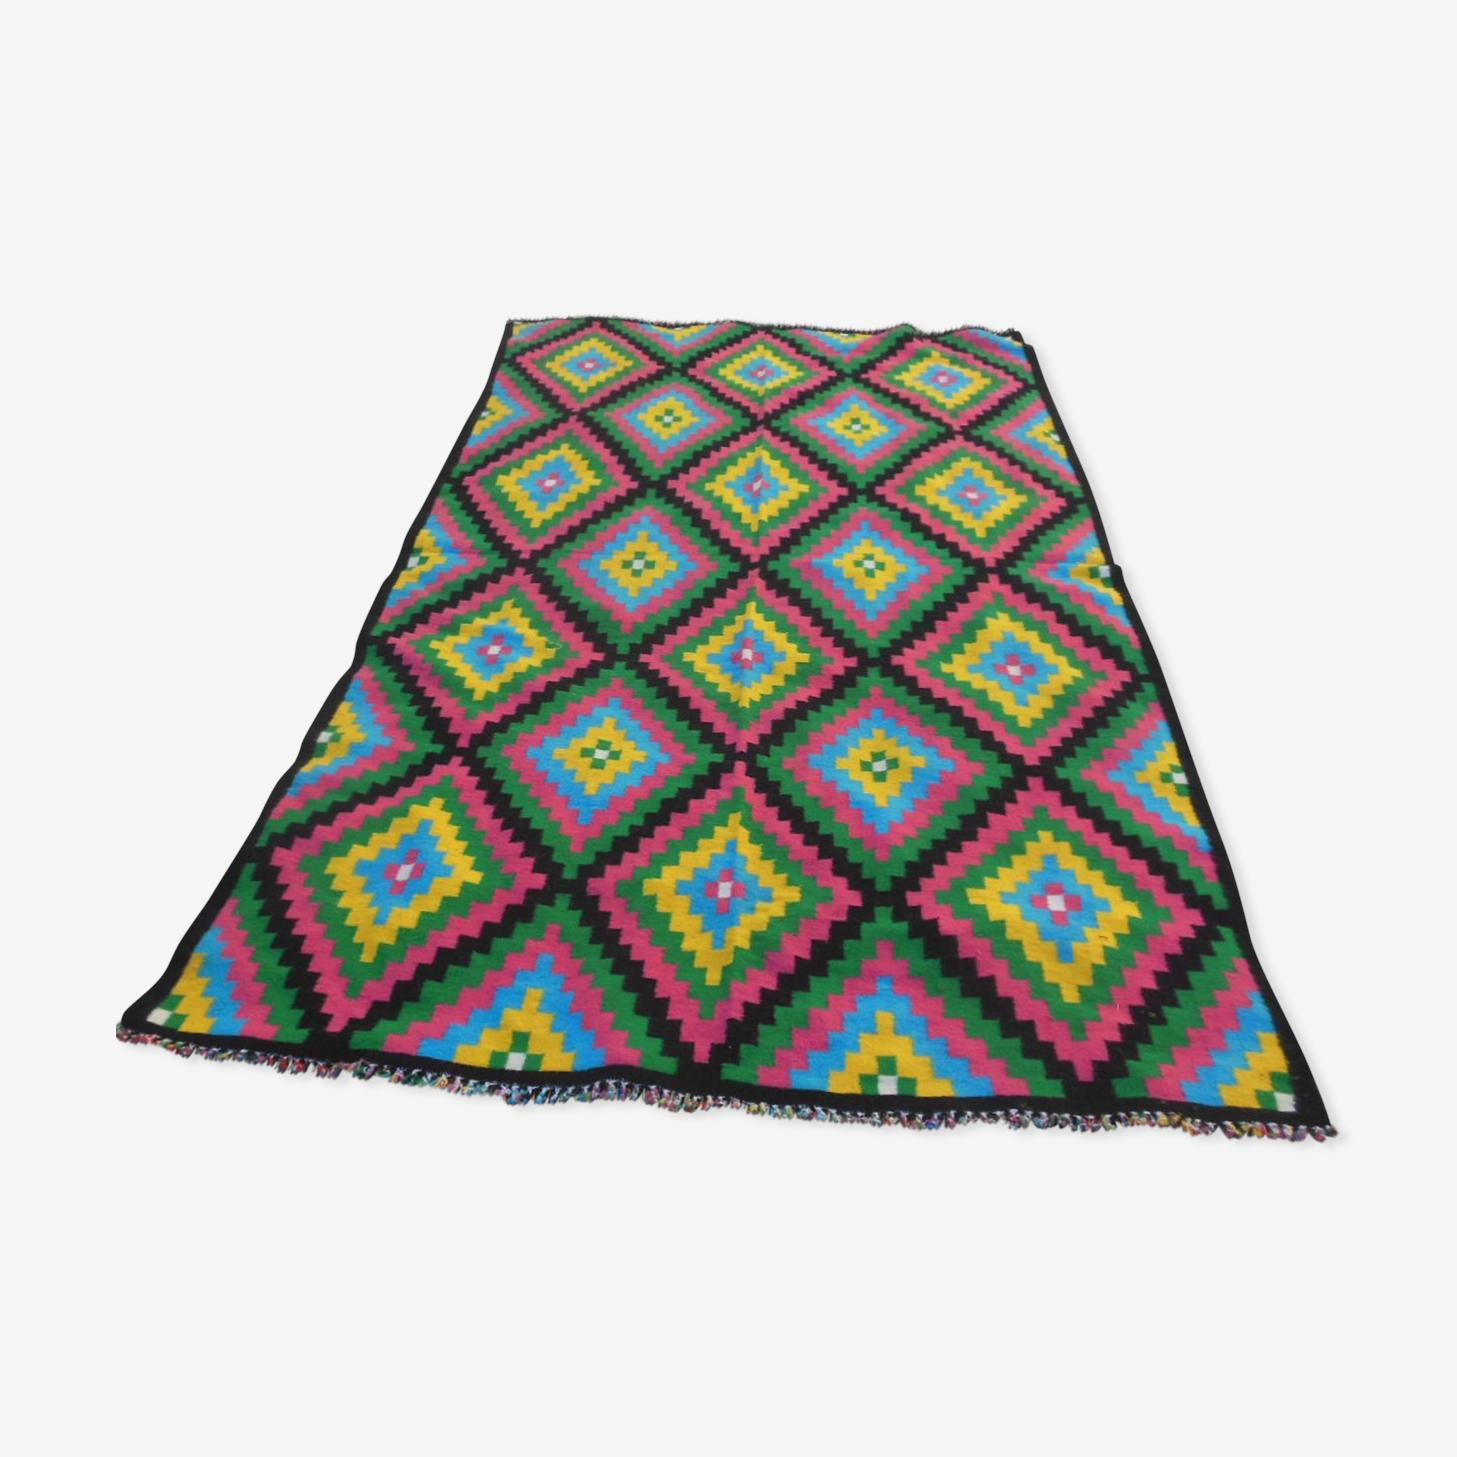 Grand tapis vintage, pure laine tissée, type kilim, 260x148cm